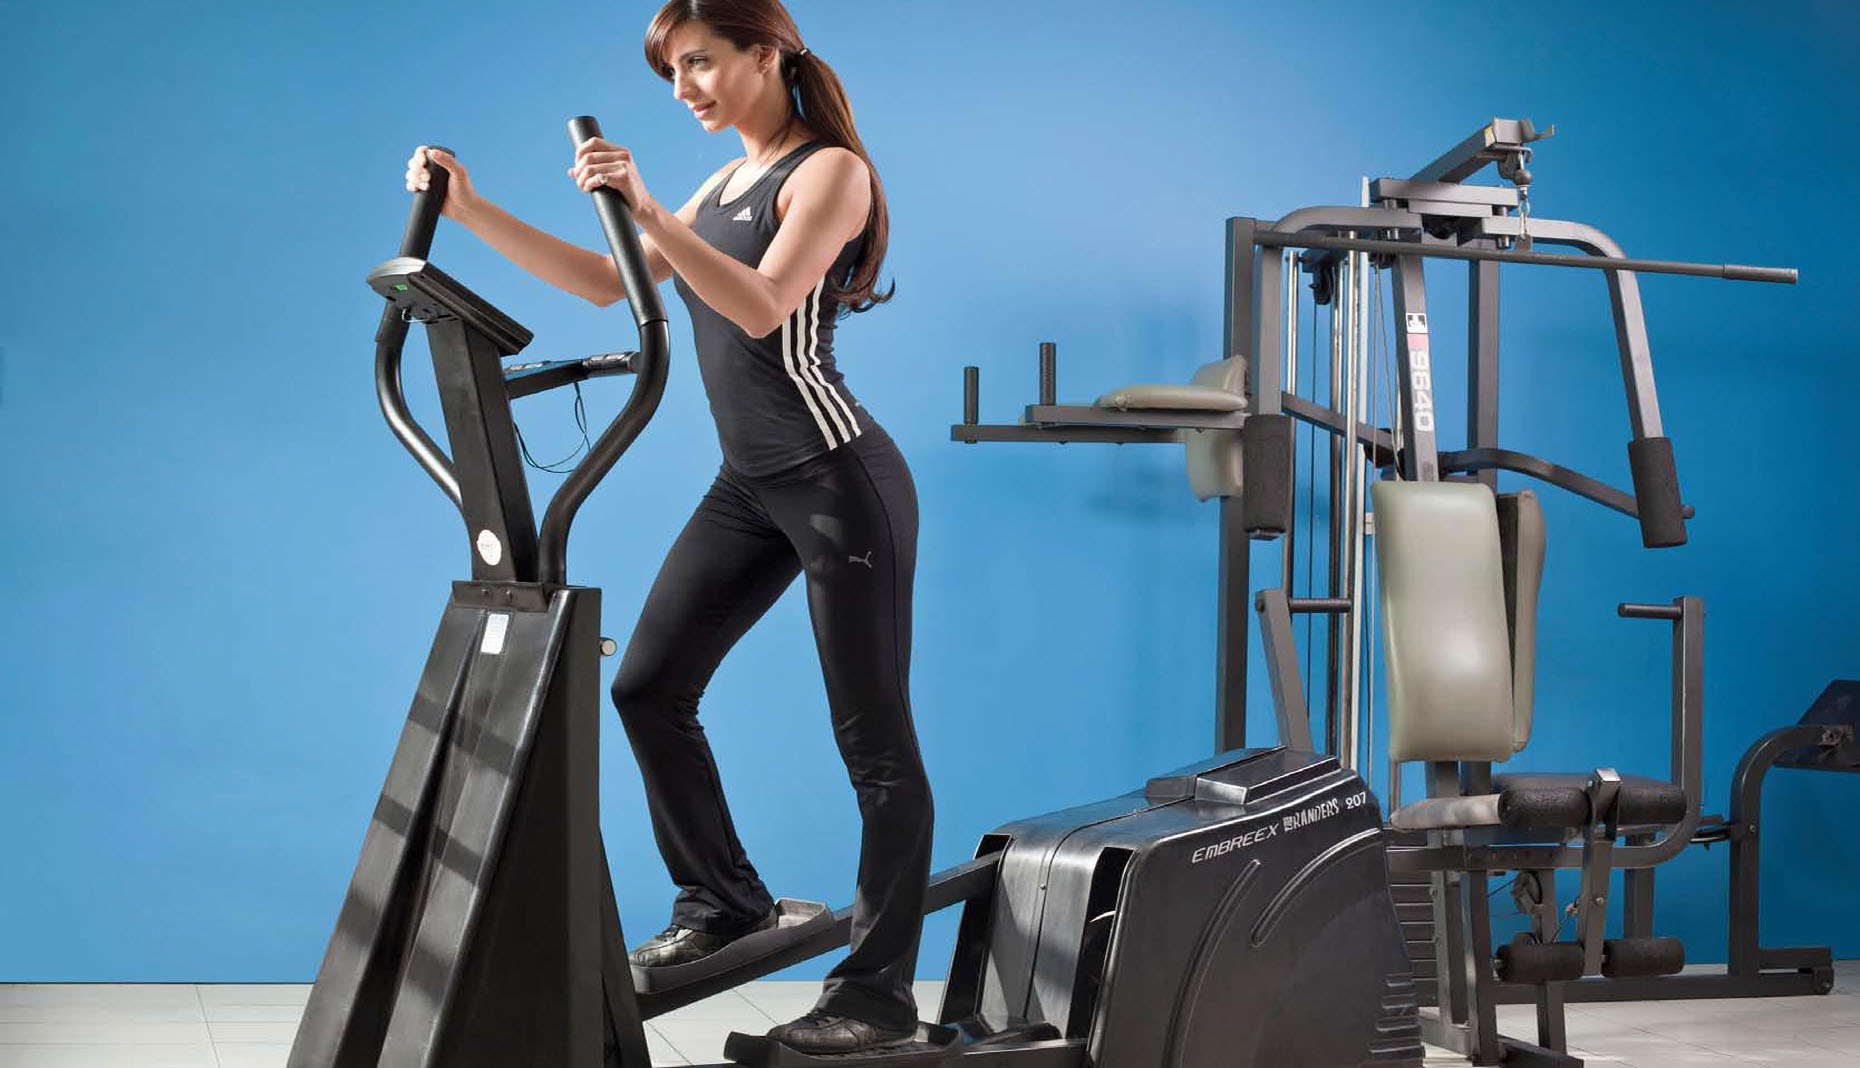 Rutina de aeróbicos en elíptica para perder peso